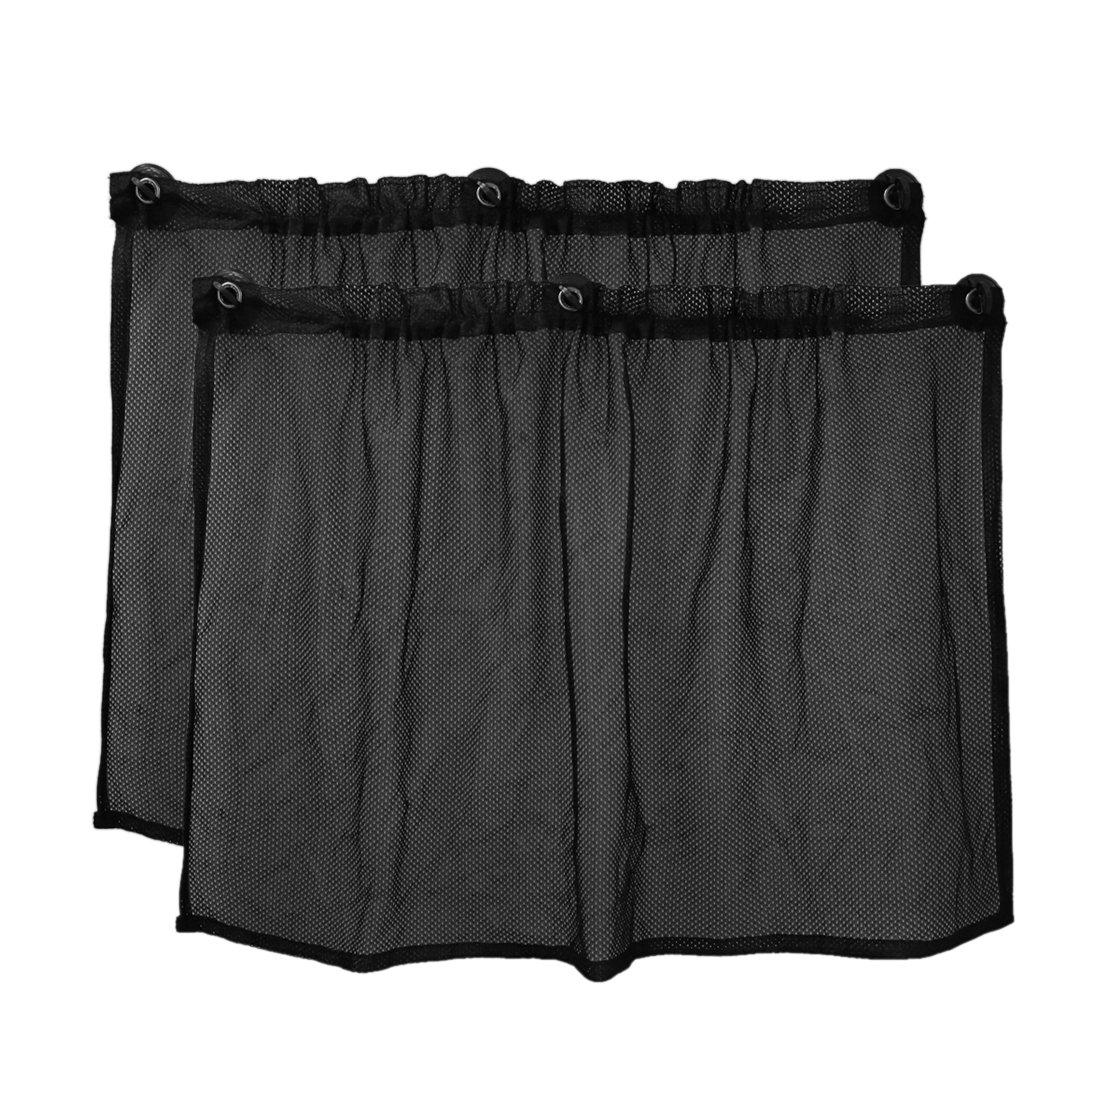 uxcell 2pcs Black Car Mesh Sun Shade Suction Cup Side Window Curtain 75 x 50cm